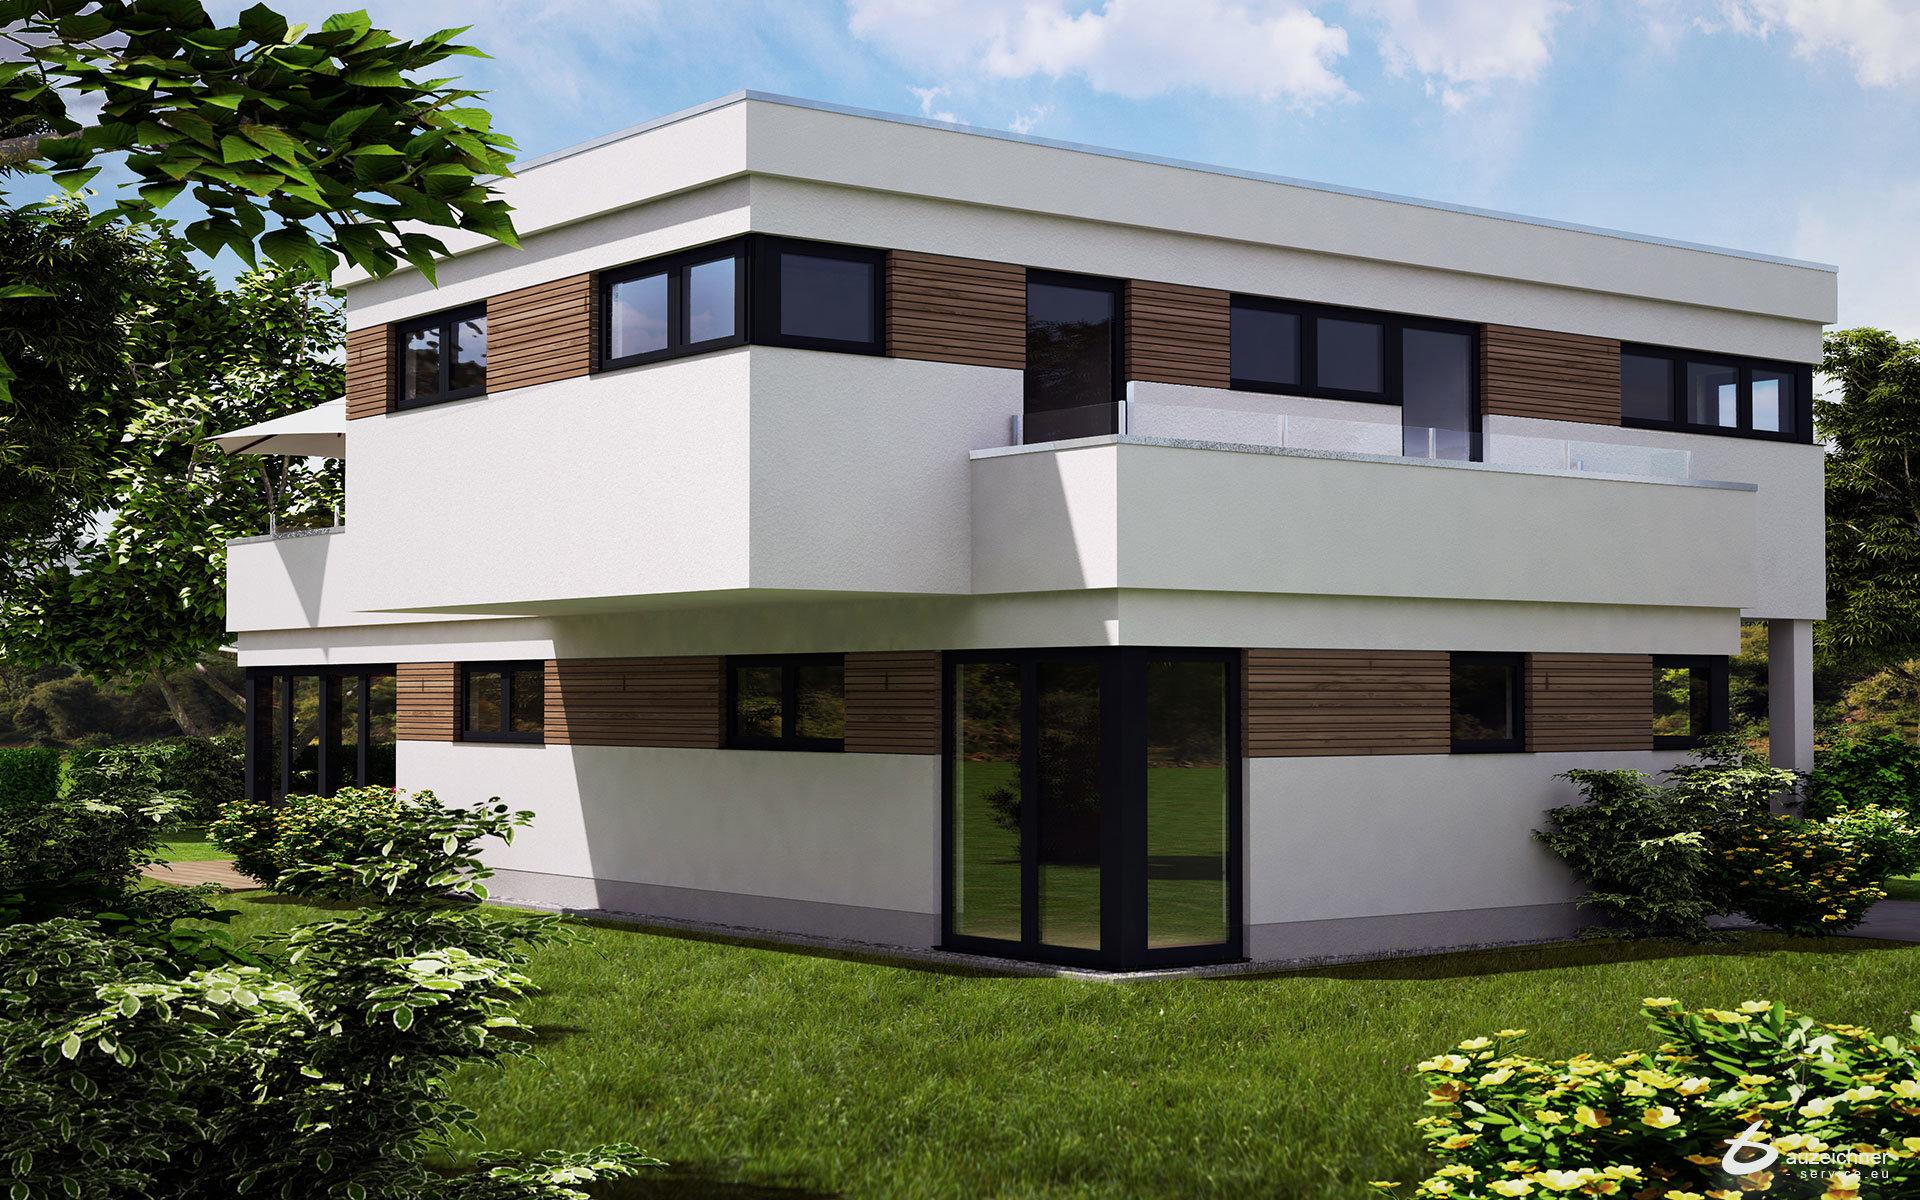 visualisierung eines modernen hauses in m nchen poing. Black Bedroom Furniture Sets. Home Design Ideas